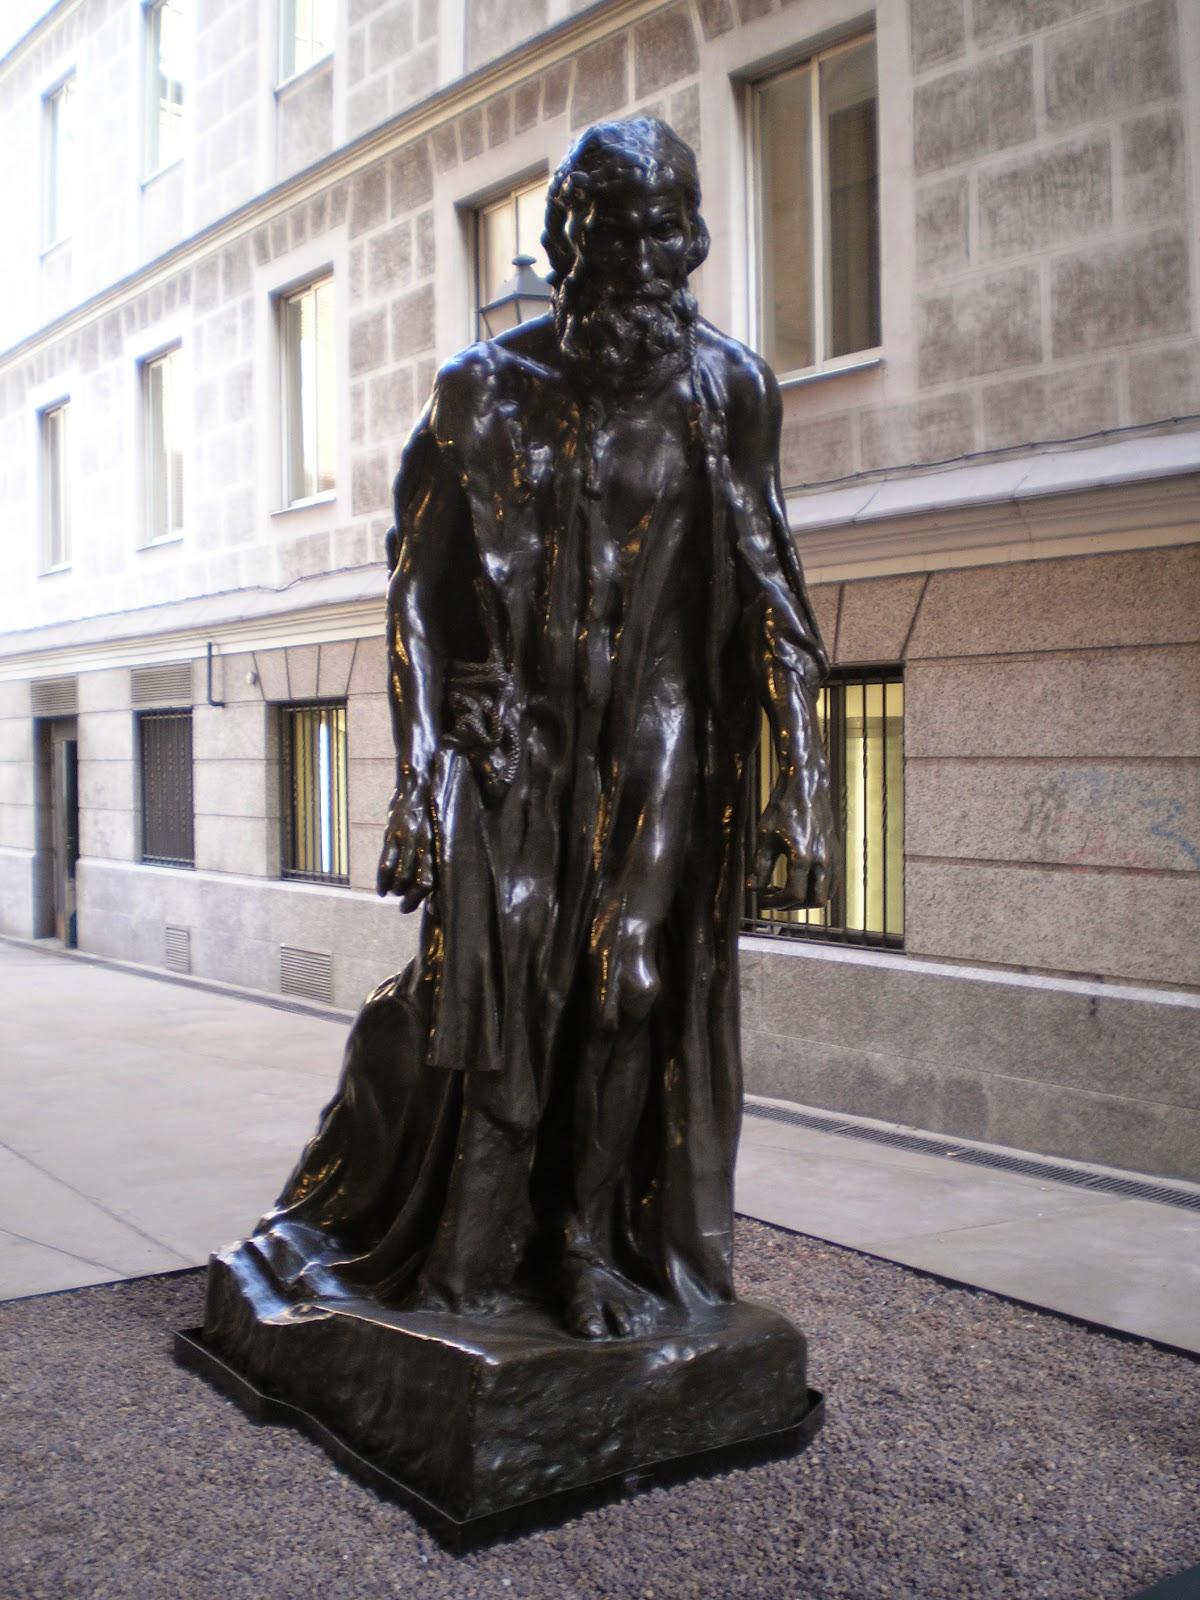 http://upload.wikimedia.org/wikipedia/commons/5/5e/Eustache_de_Saint_Pierre-Rodin-Caixaforum.jpg